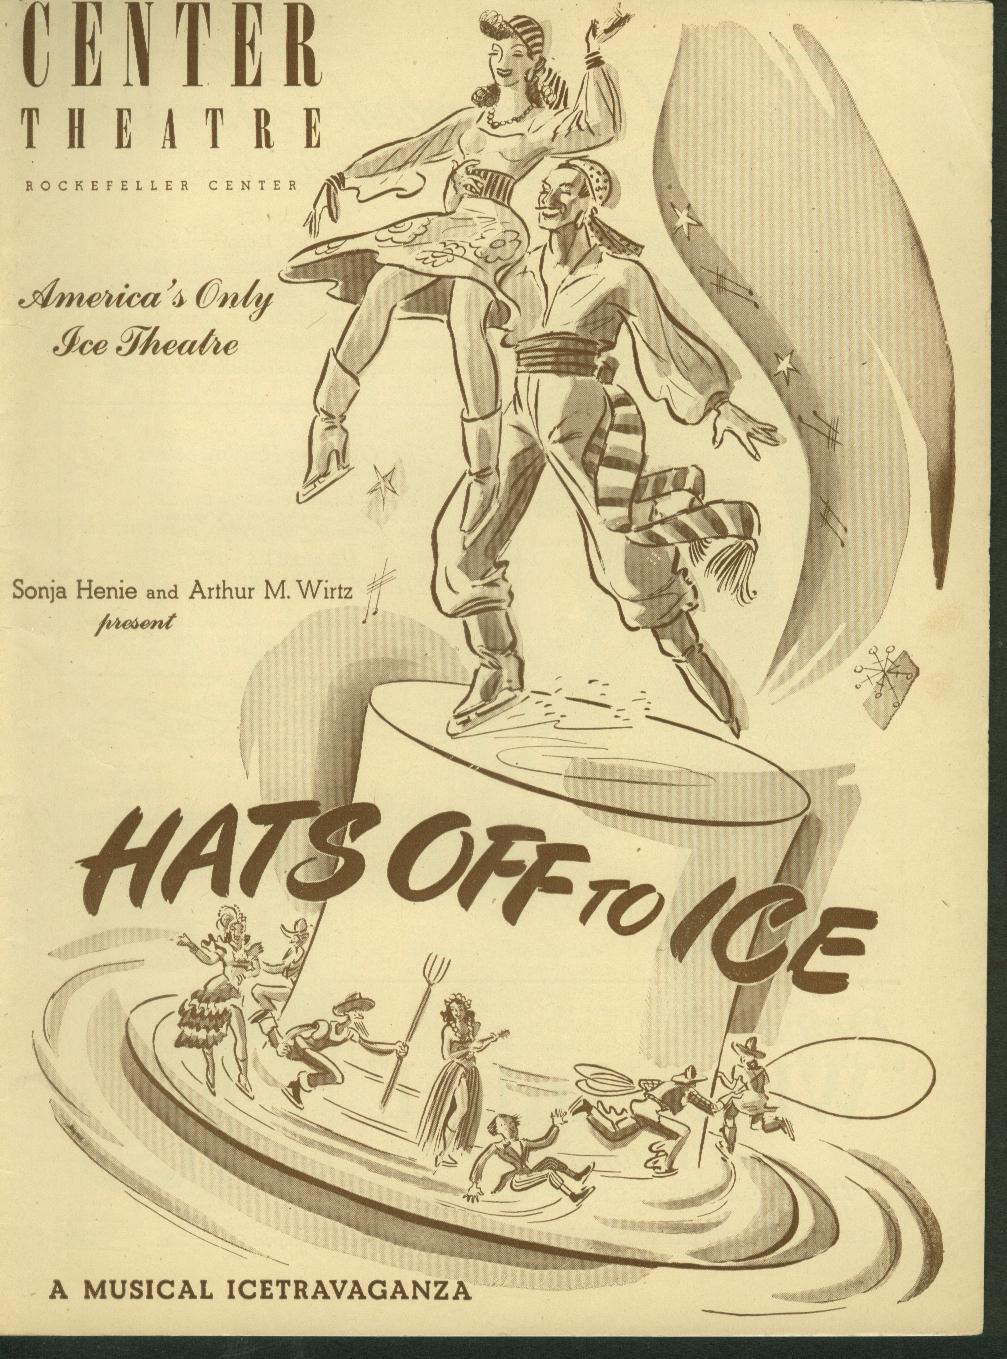 Center Theatre Rockefeller Hats Off to ice Program Sonja Henie 1945